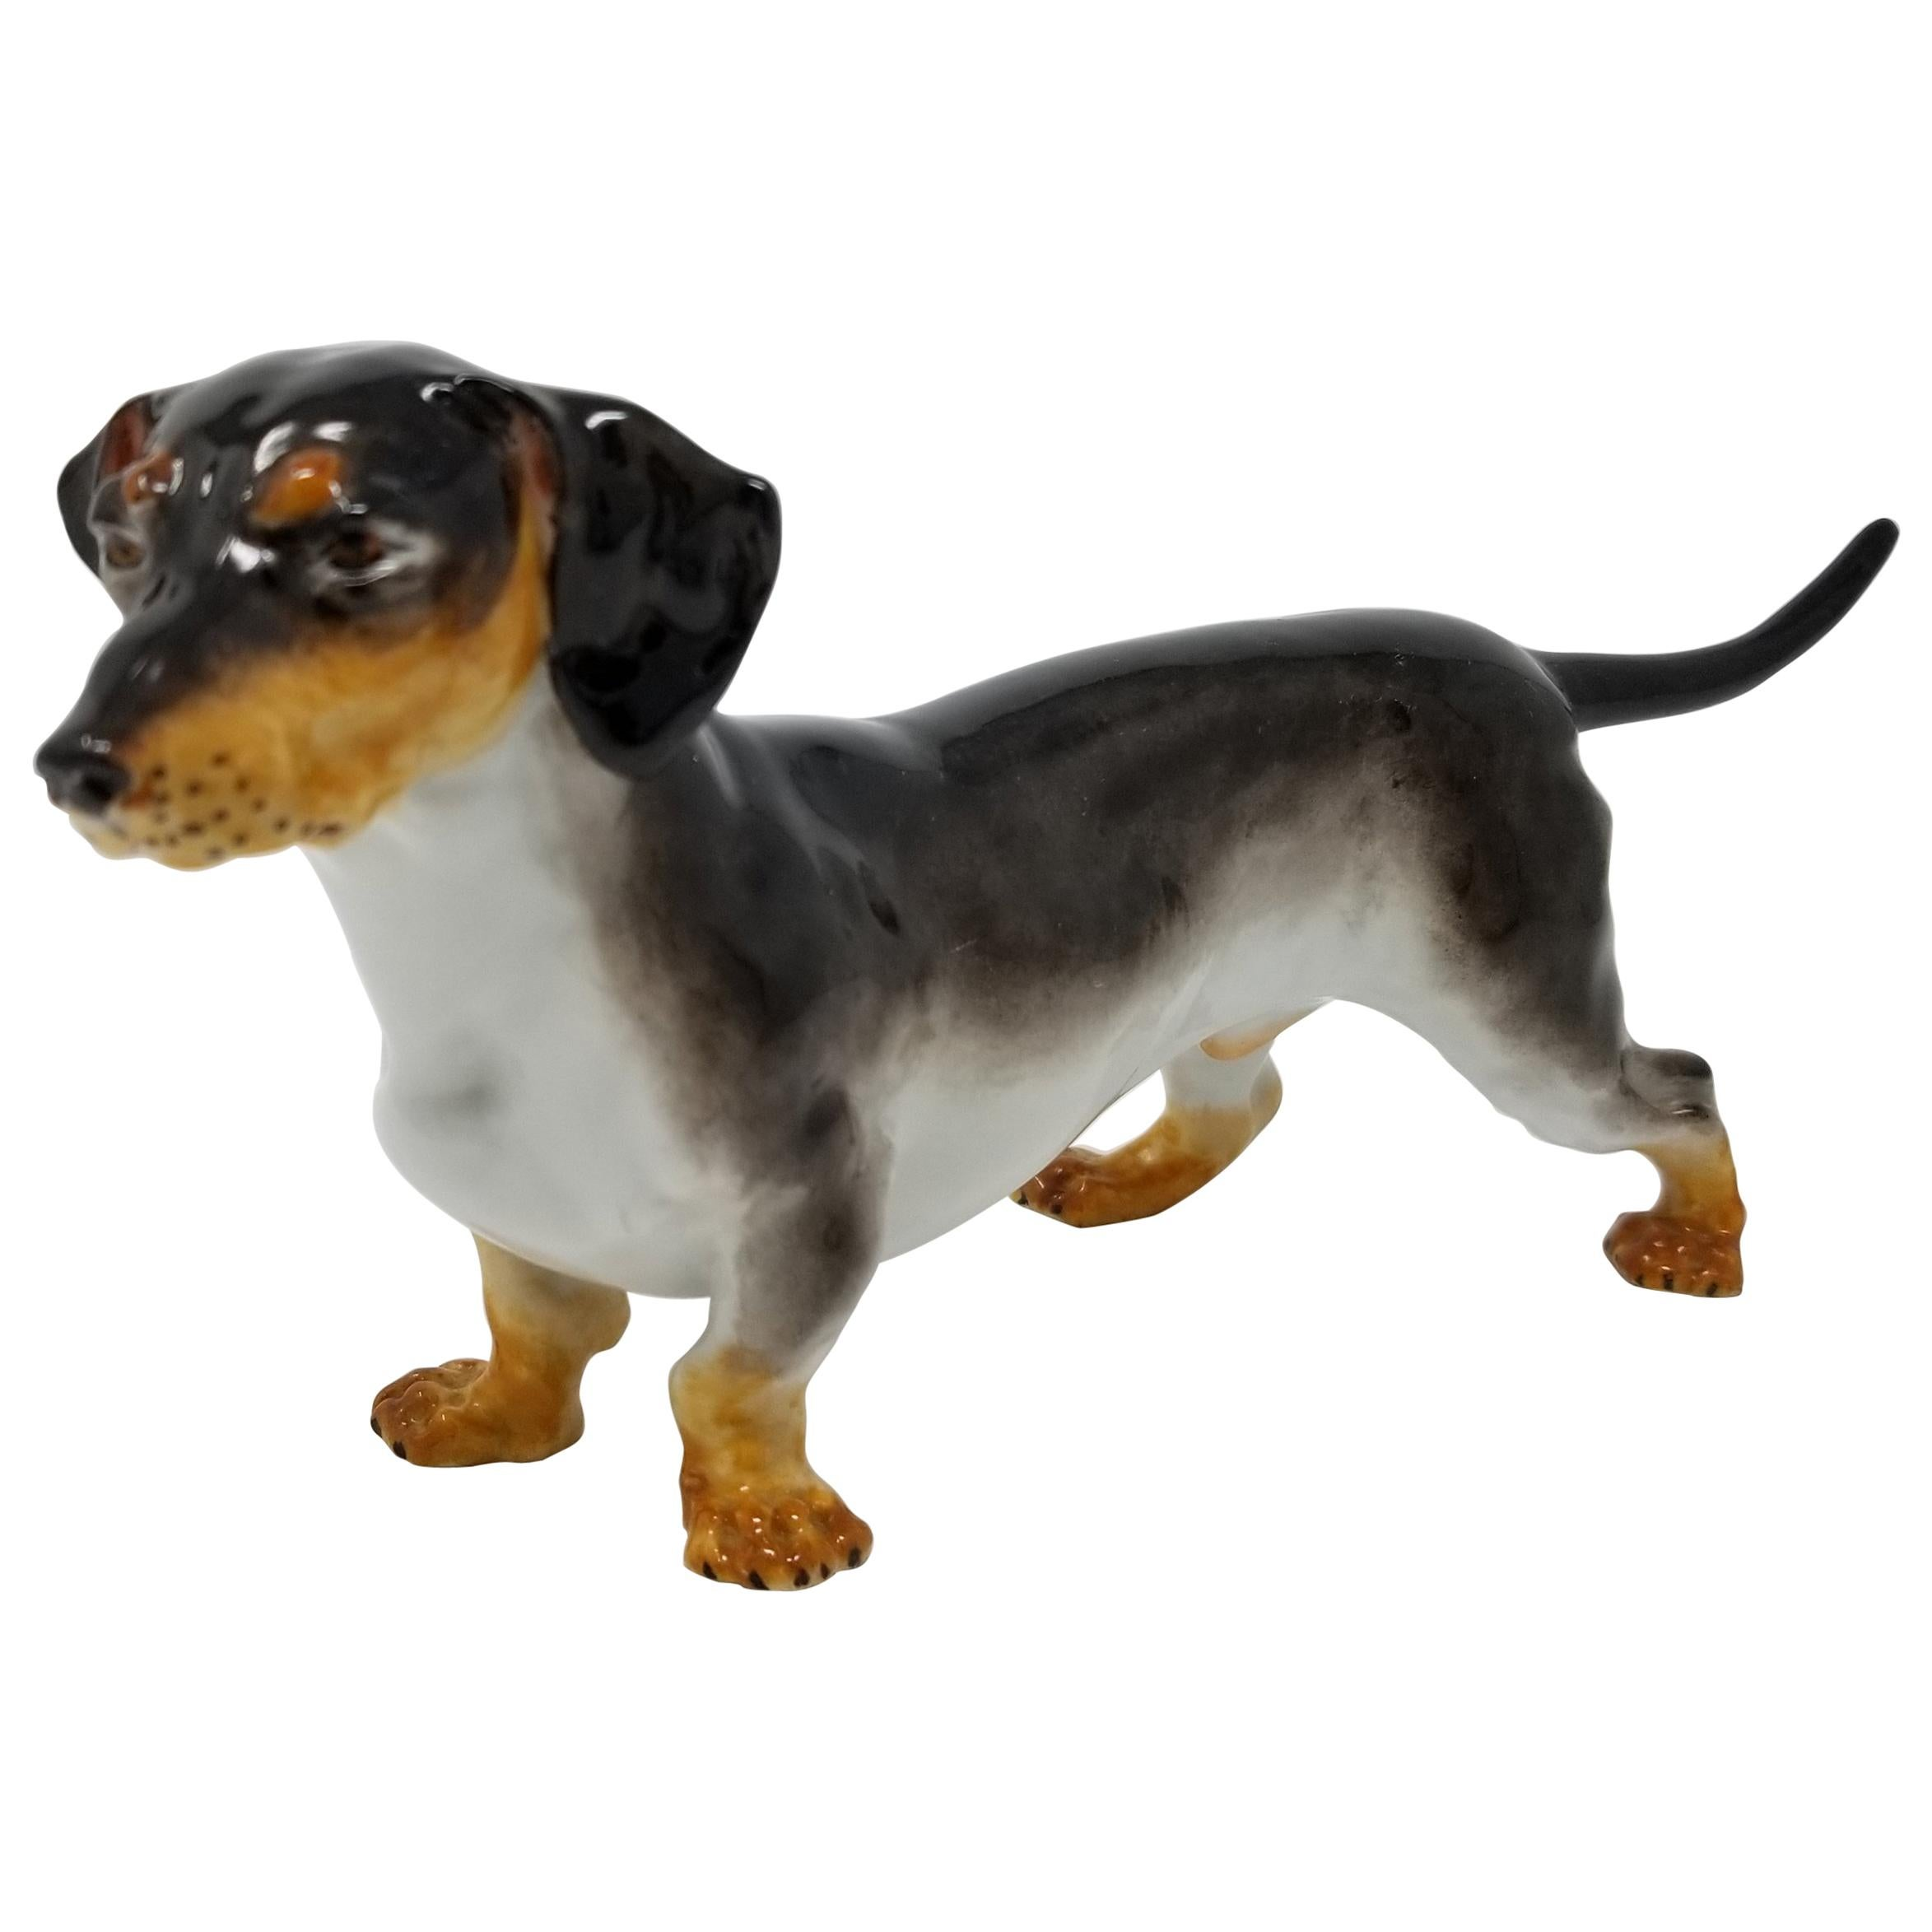 Antique Meissen Porcelain Figure of a Dachshund Dog